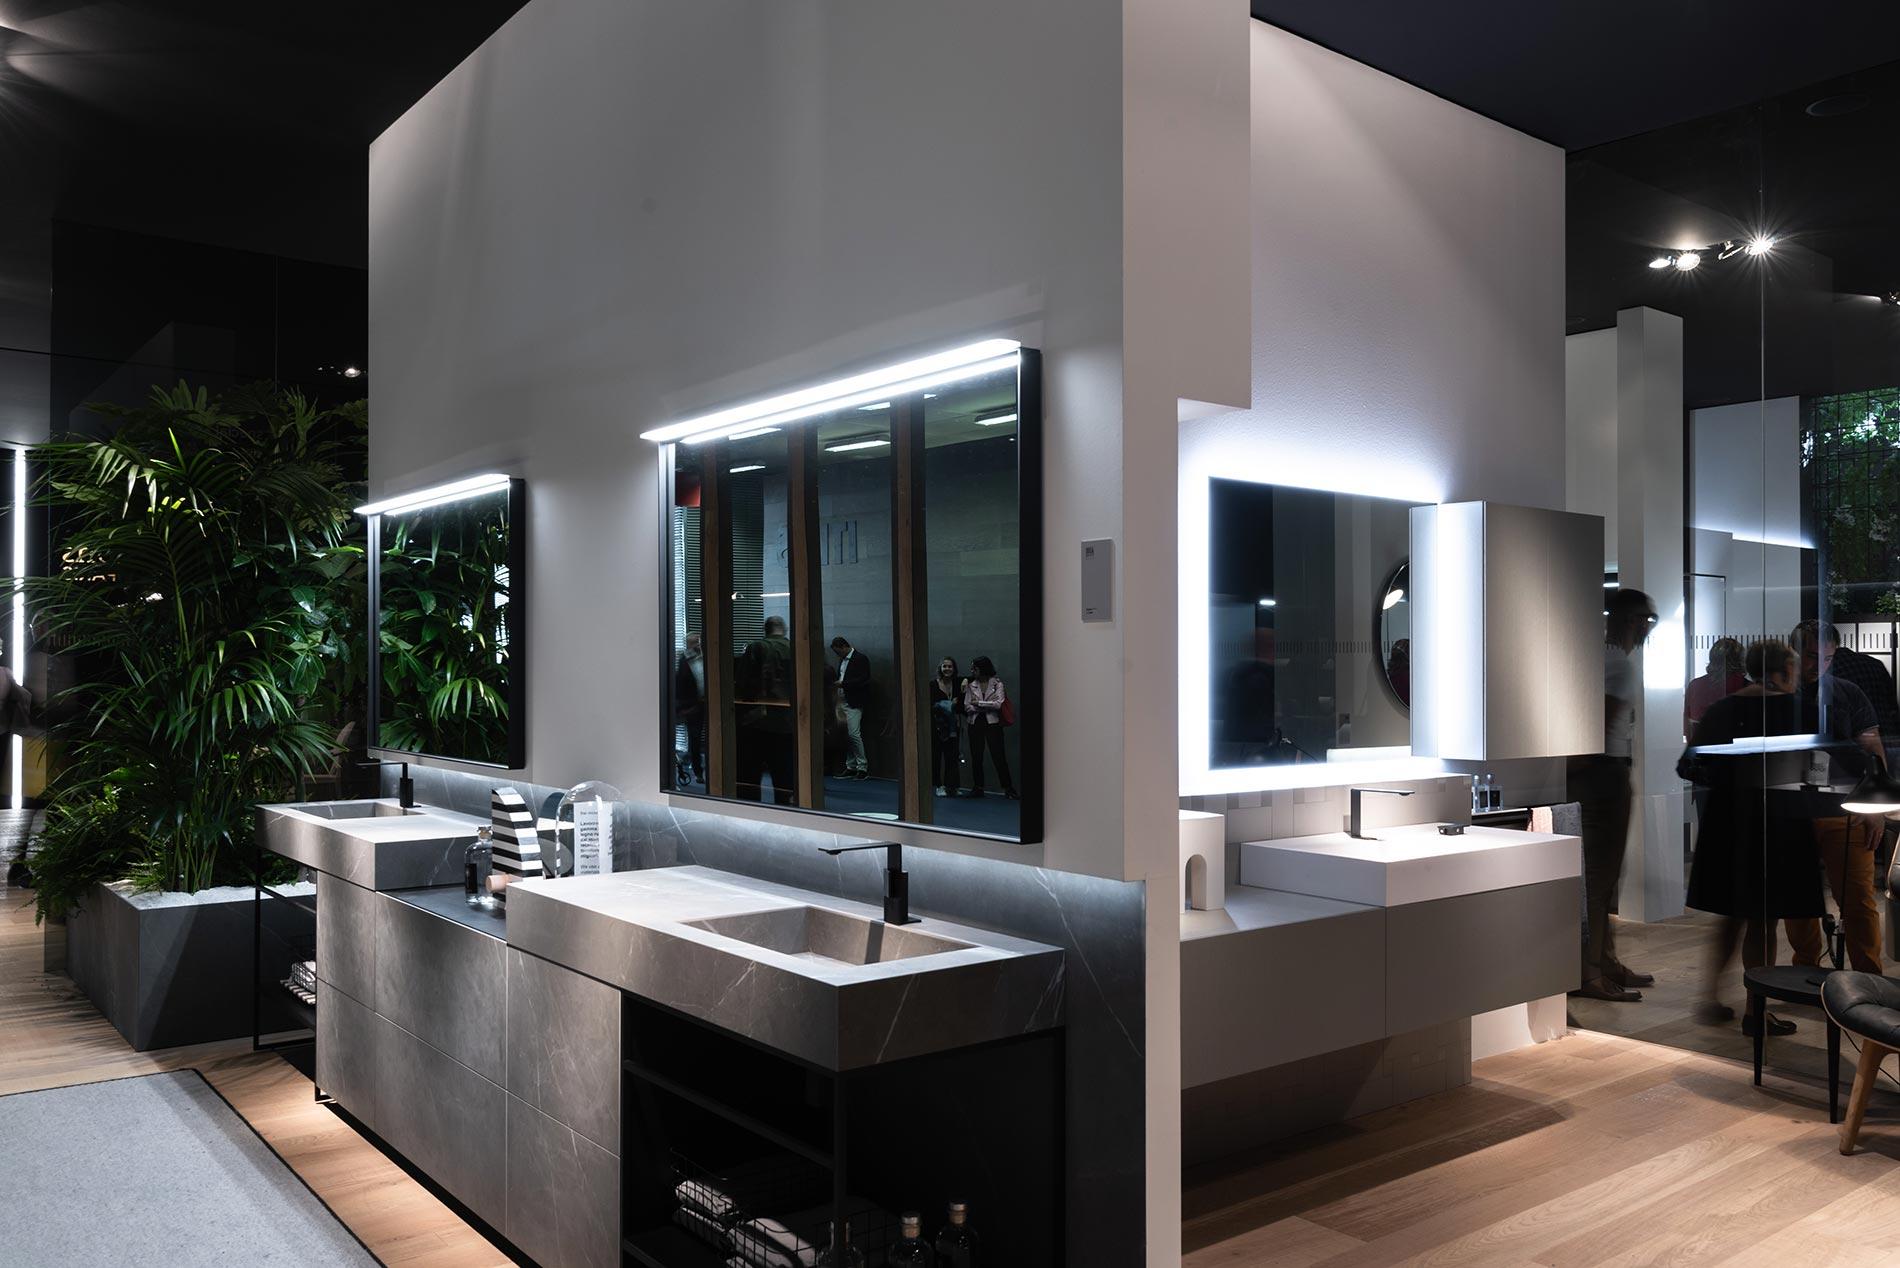 choosing the bathroom closet ideagroup cersaie